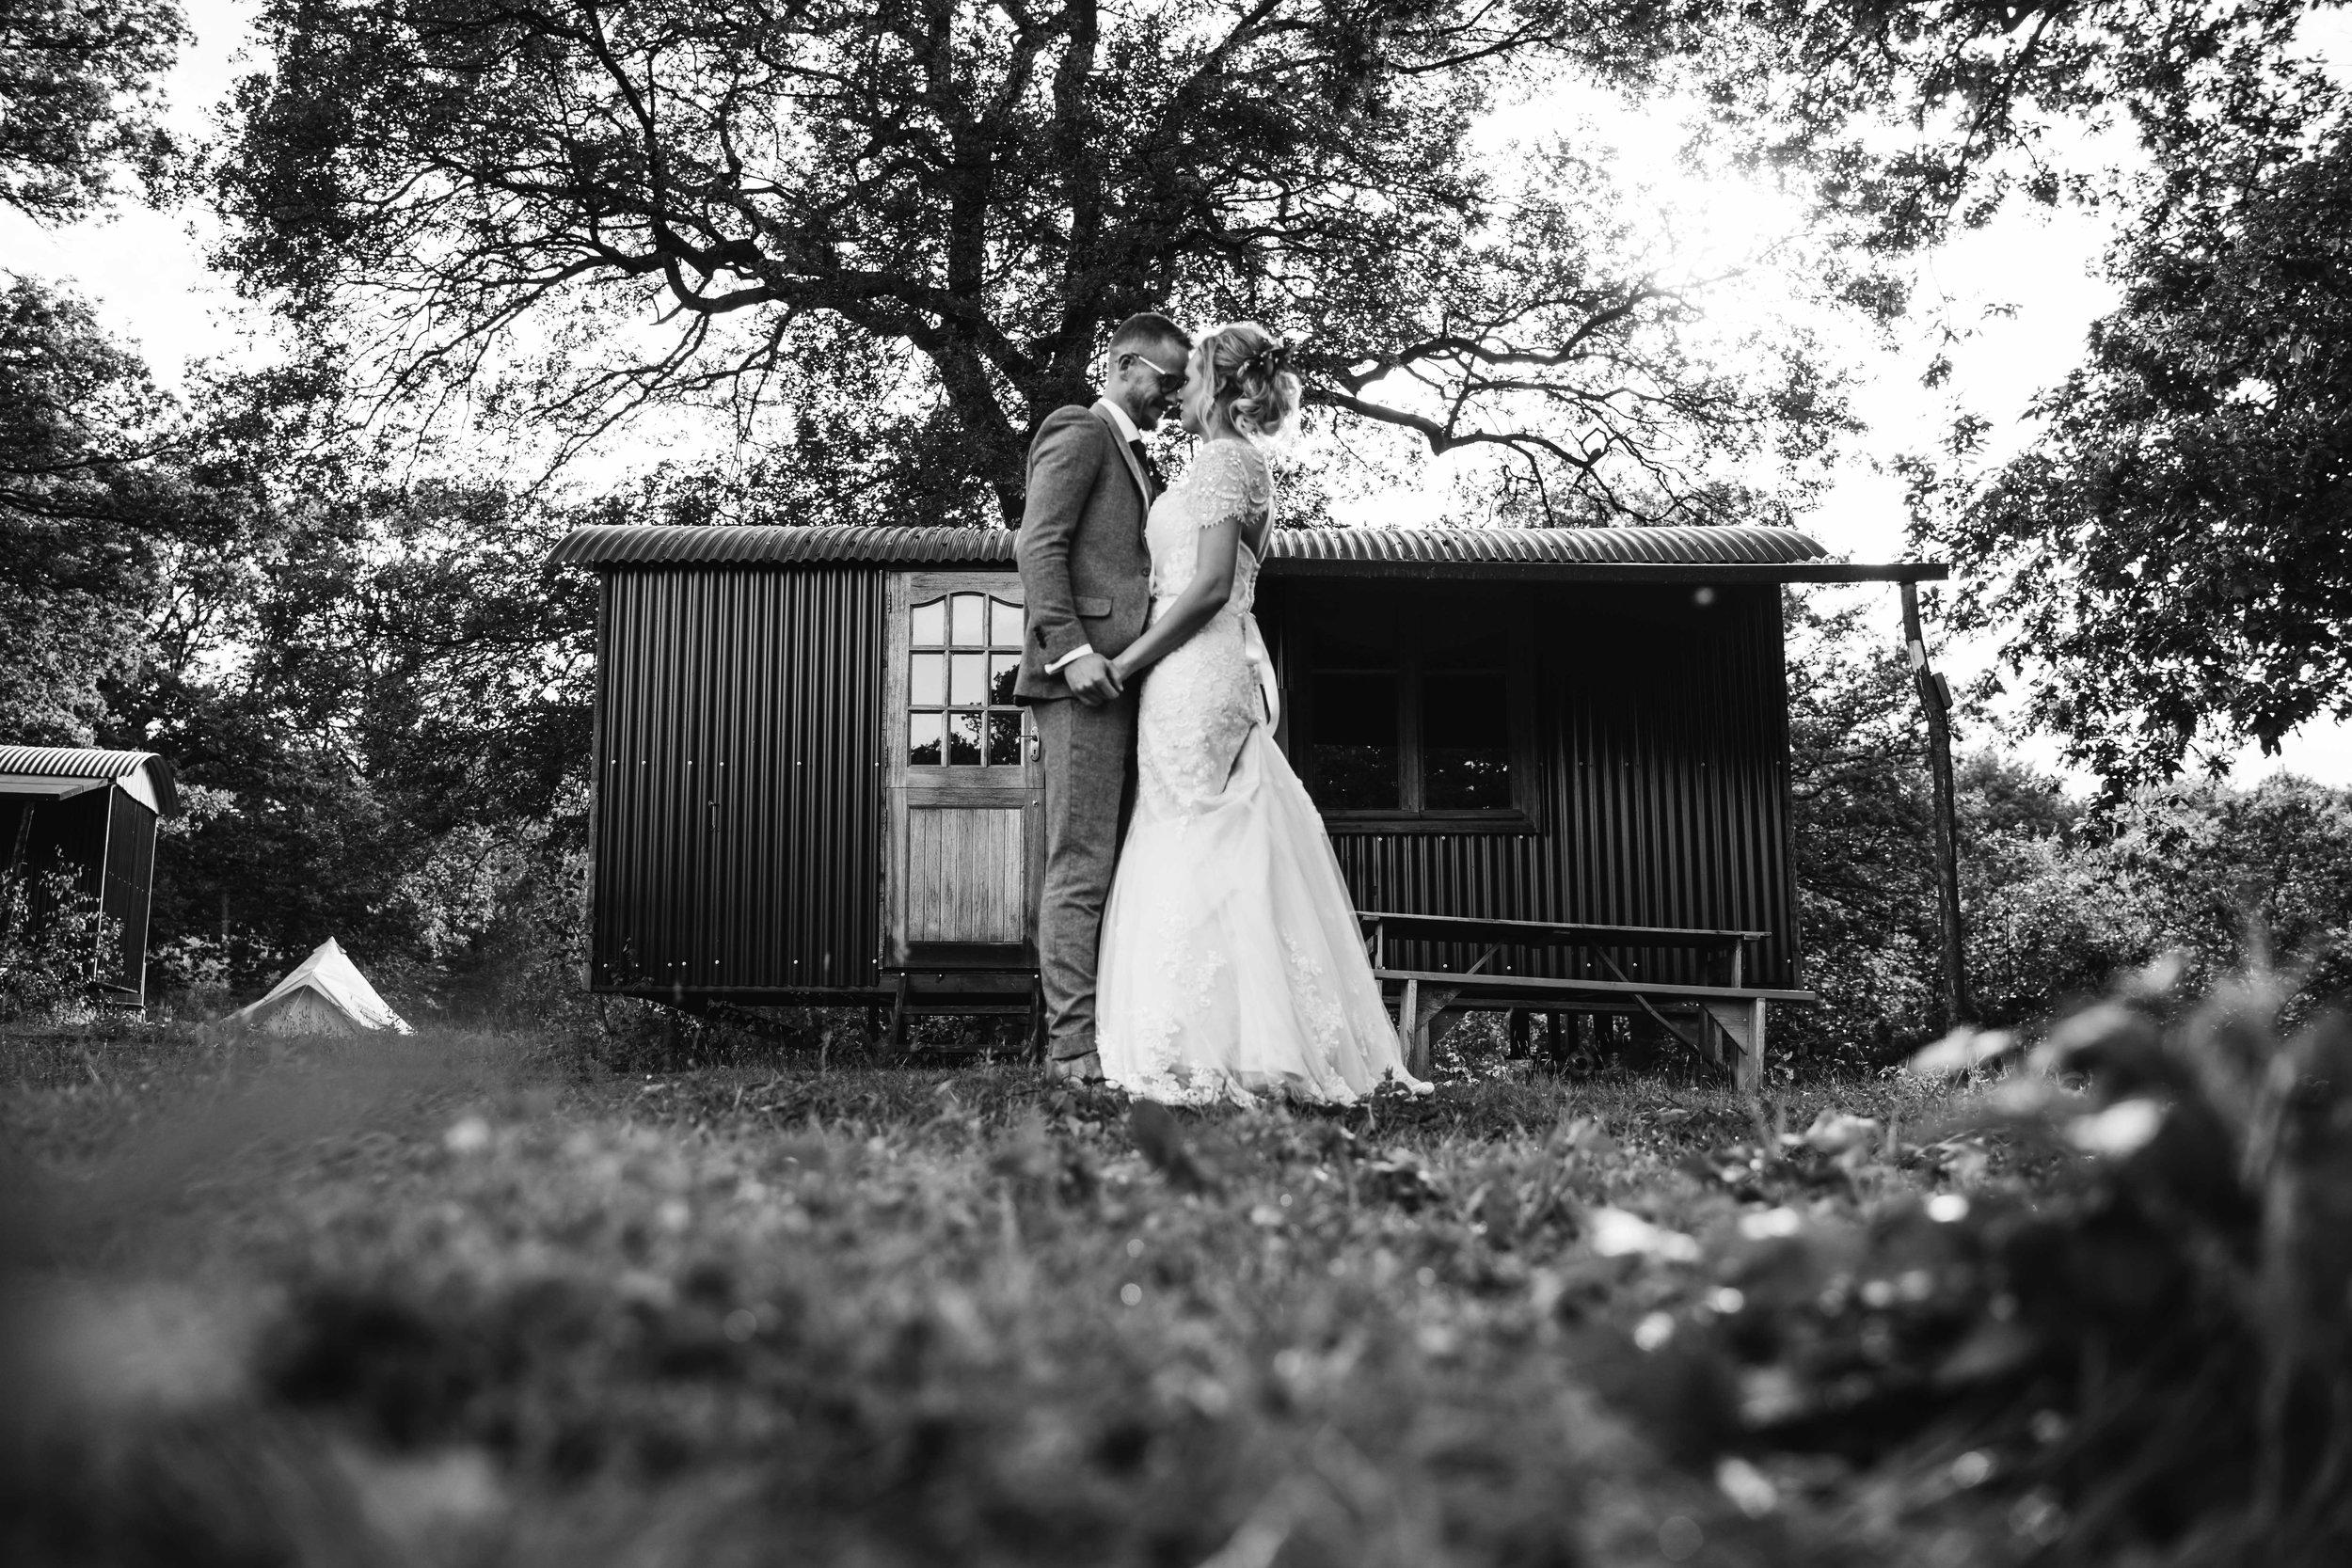 kent-wedding-photographer-108856.jpg